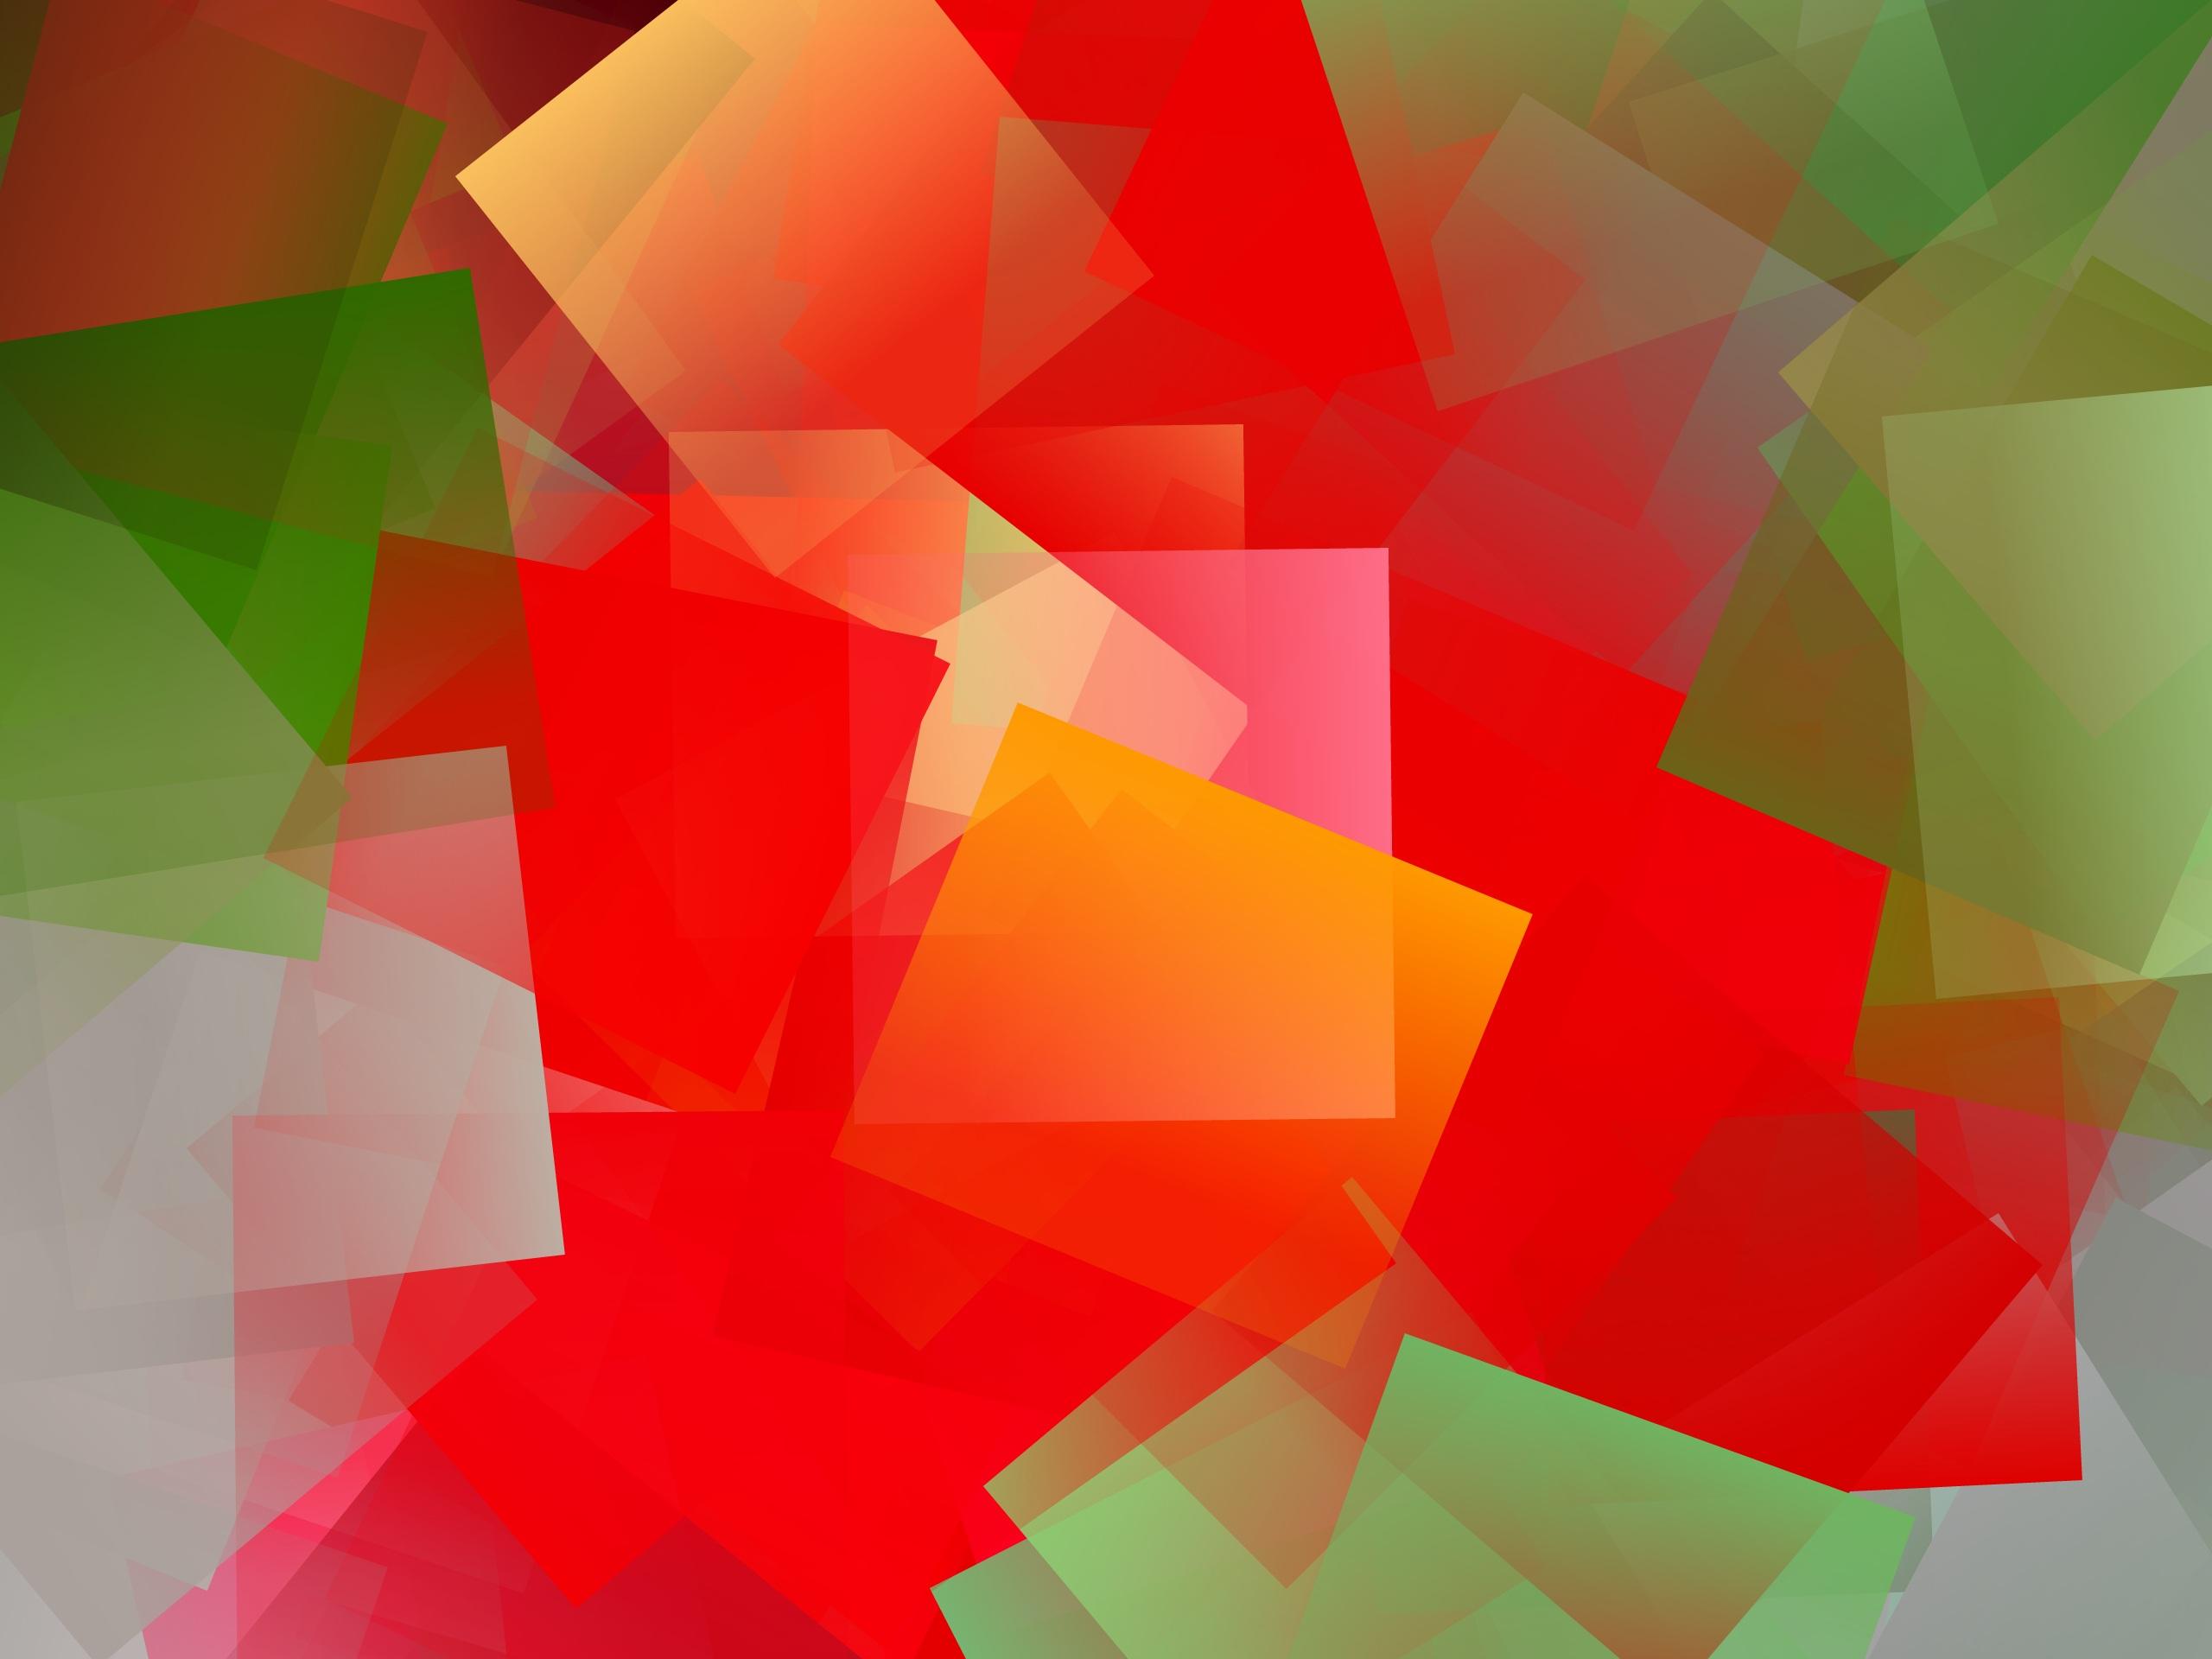 Free Images : texture, leaf, petal, pattern, line, green